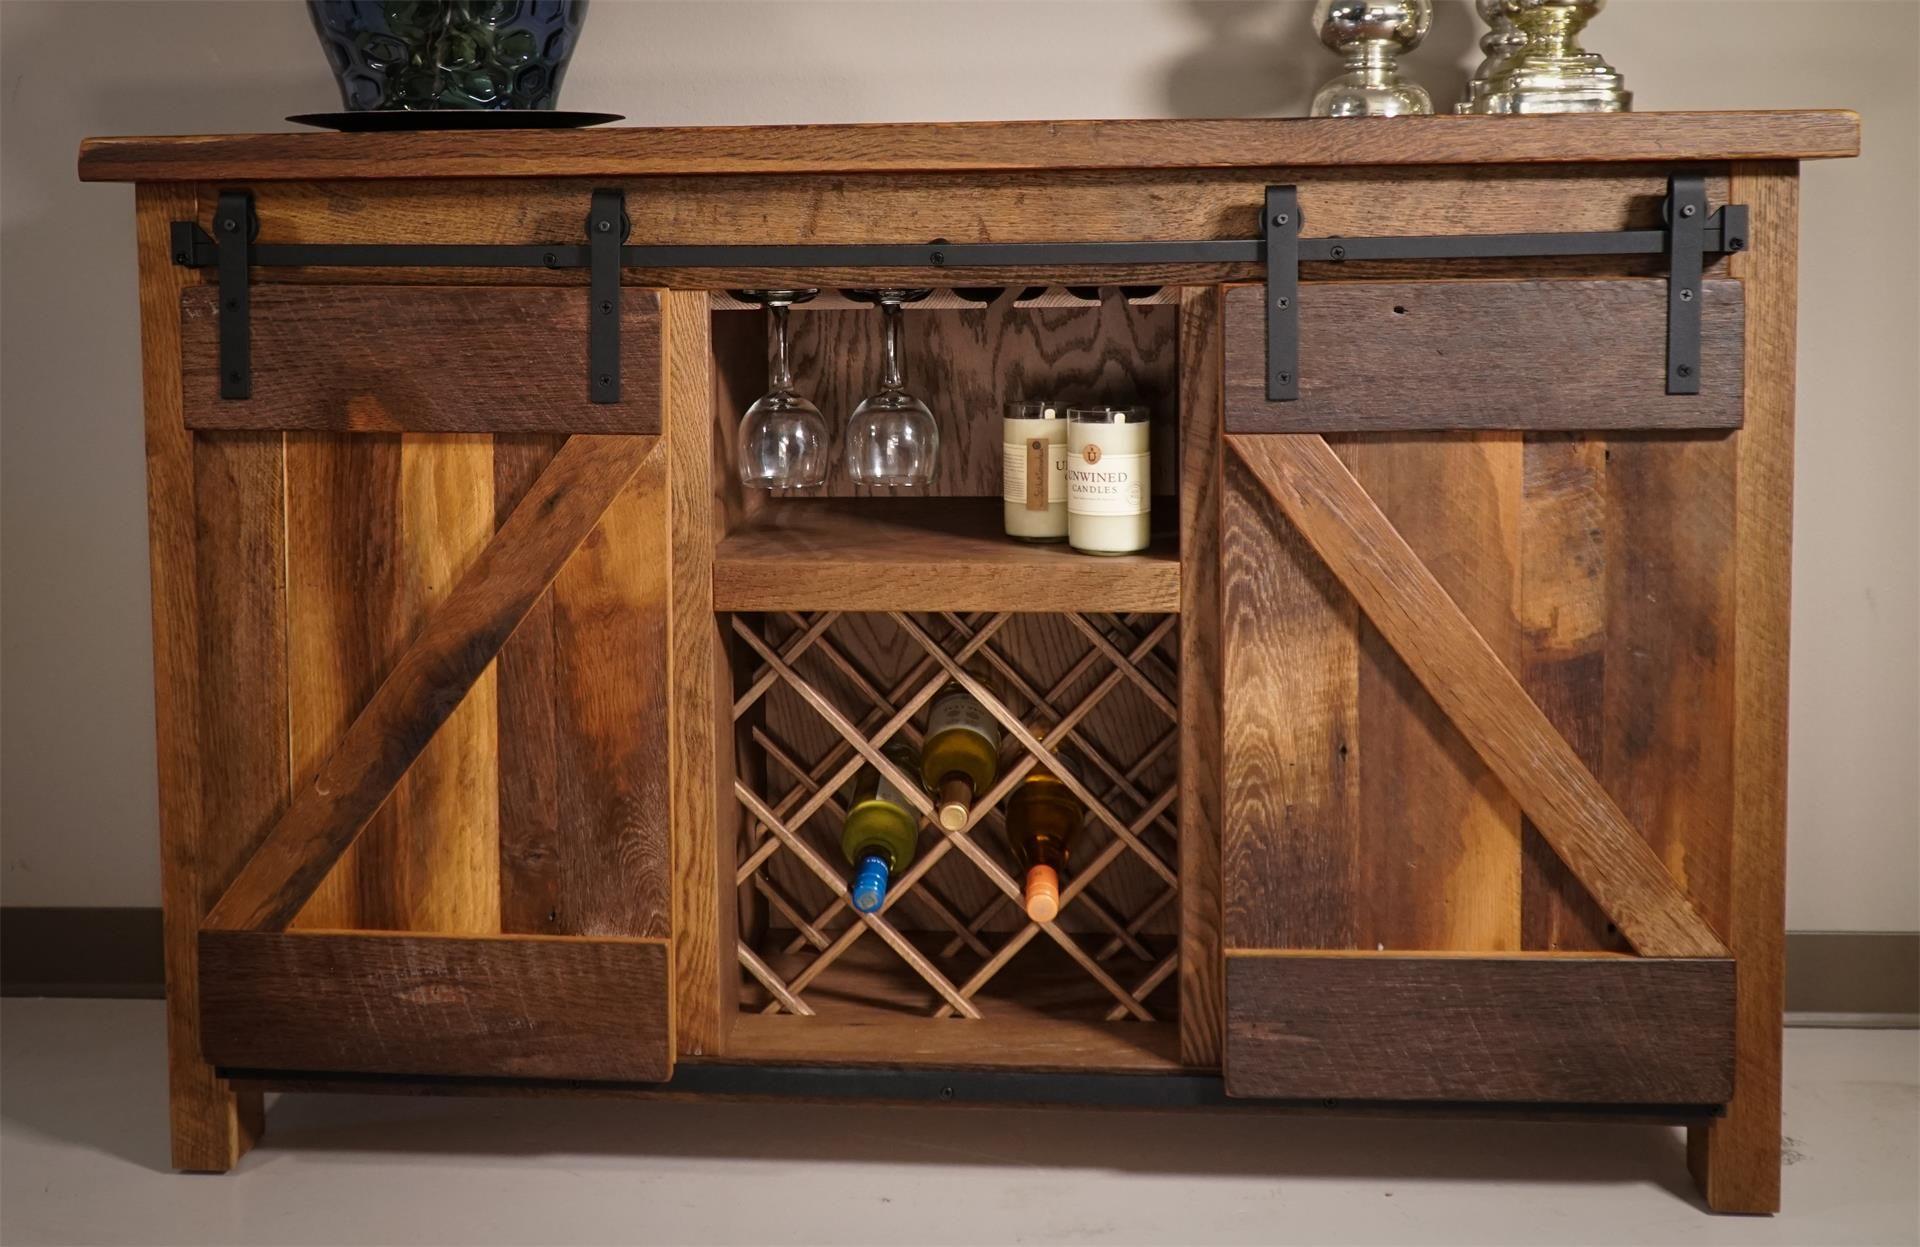 Sliding Barn Door Buffet | Sliding barn doors, Wine cabinets and ...